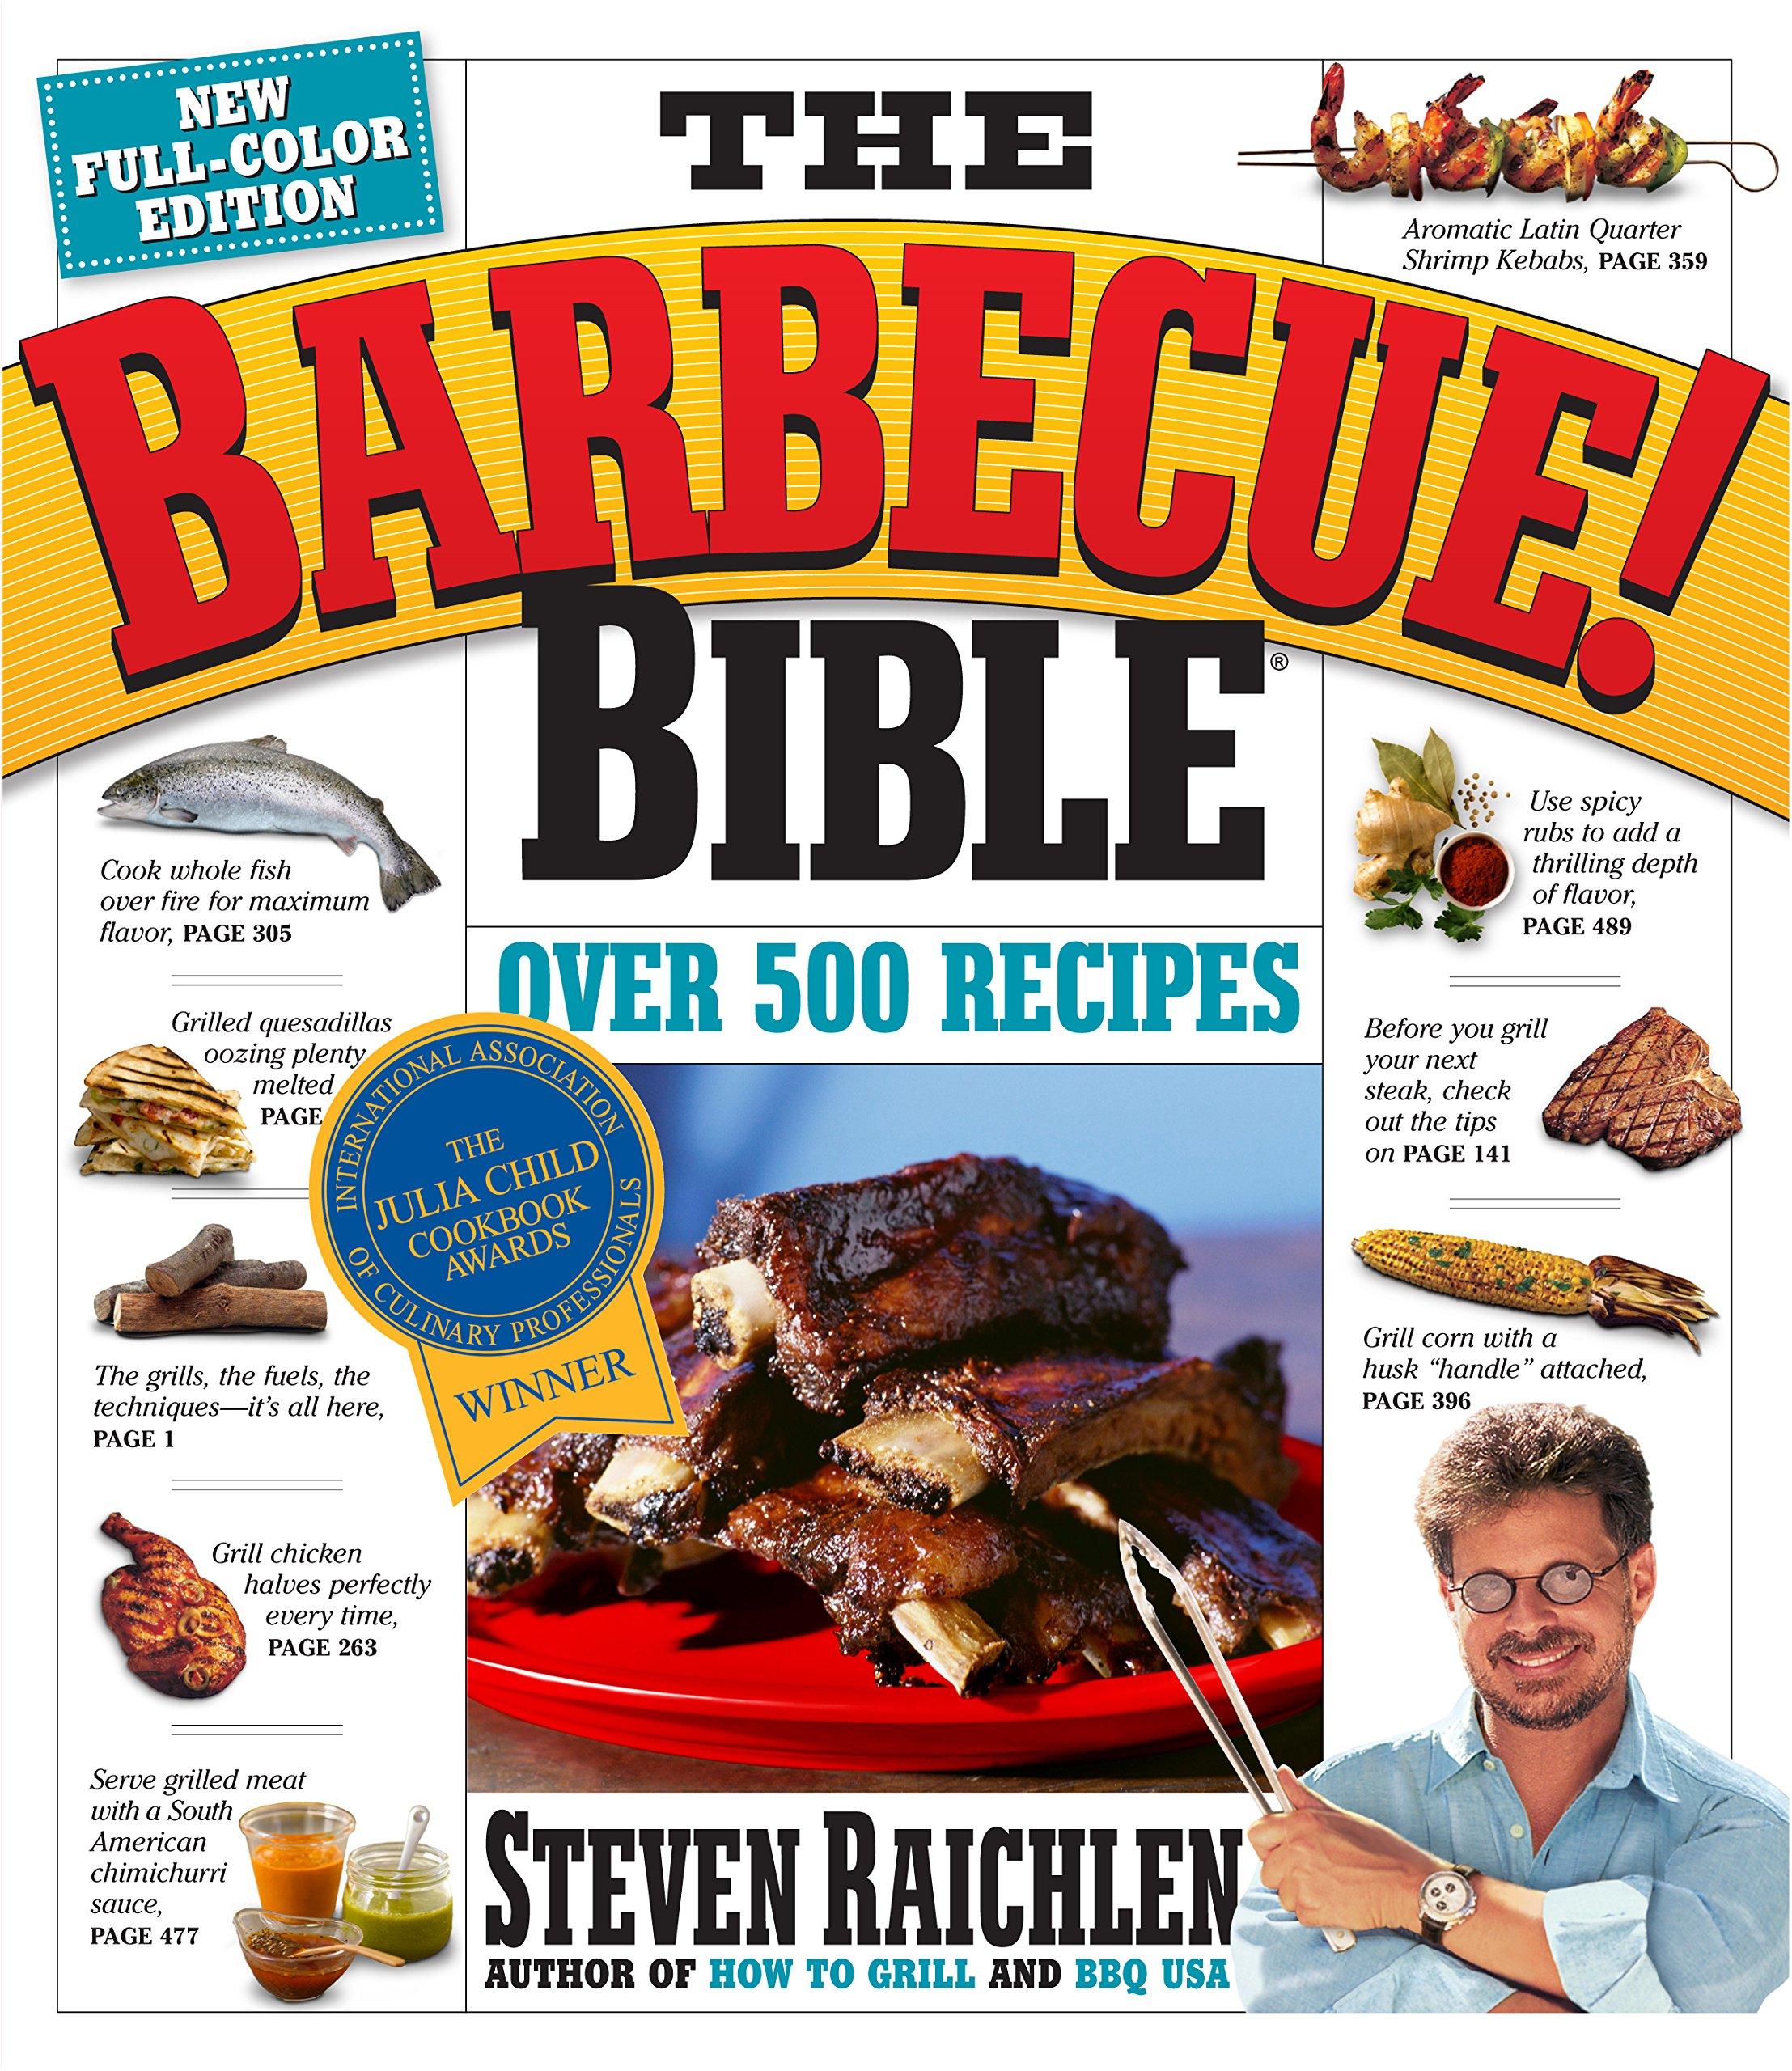 BarbecueBible.jpg